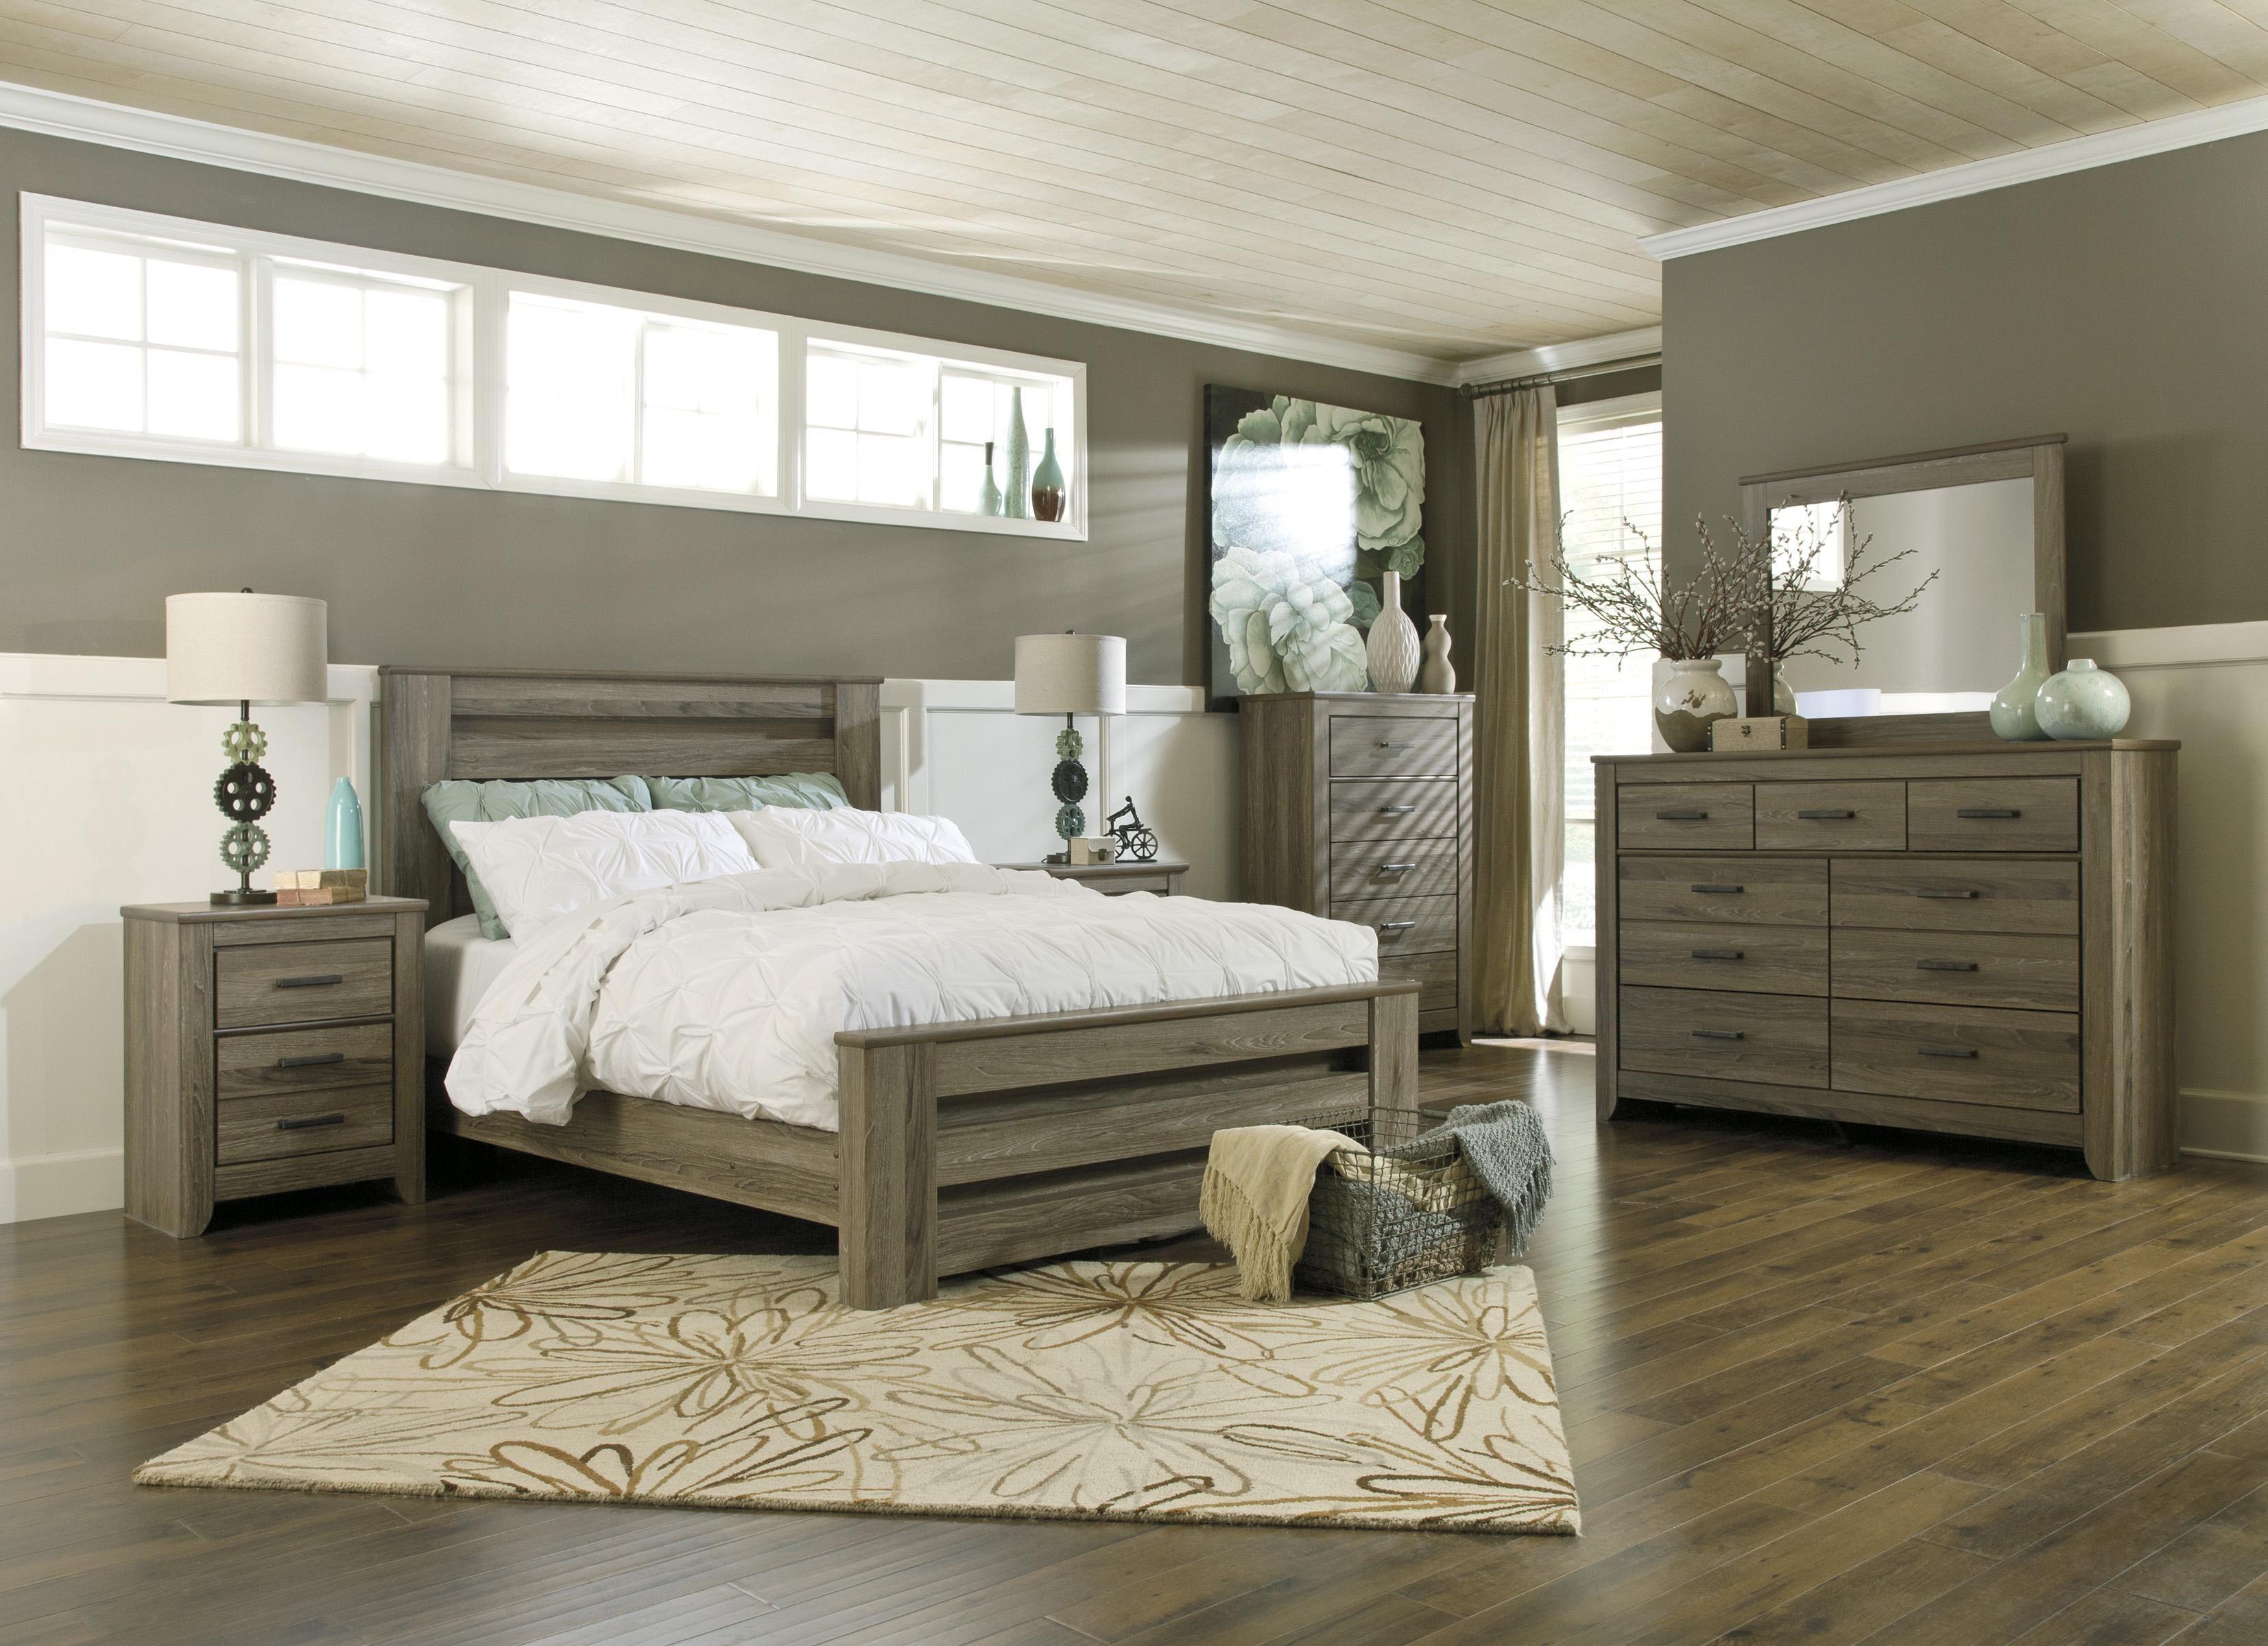 Zelen Queen Poster Bed in Warm Gray Rustic Finish by